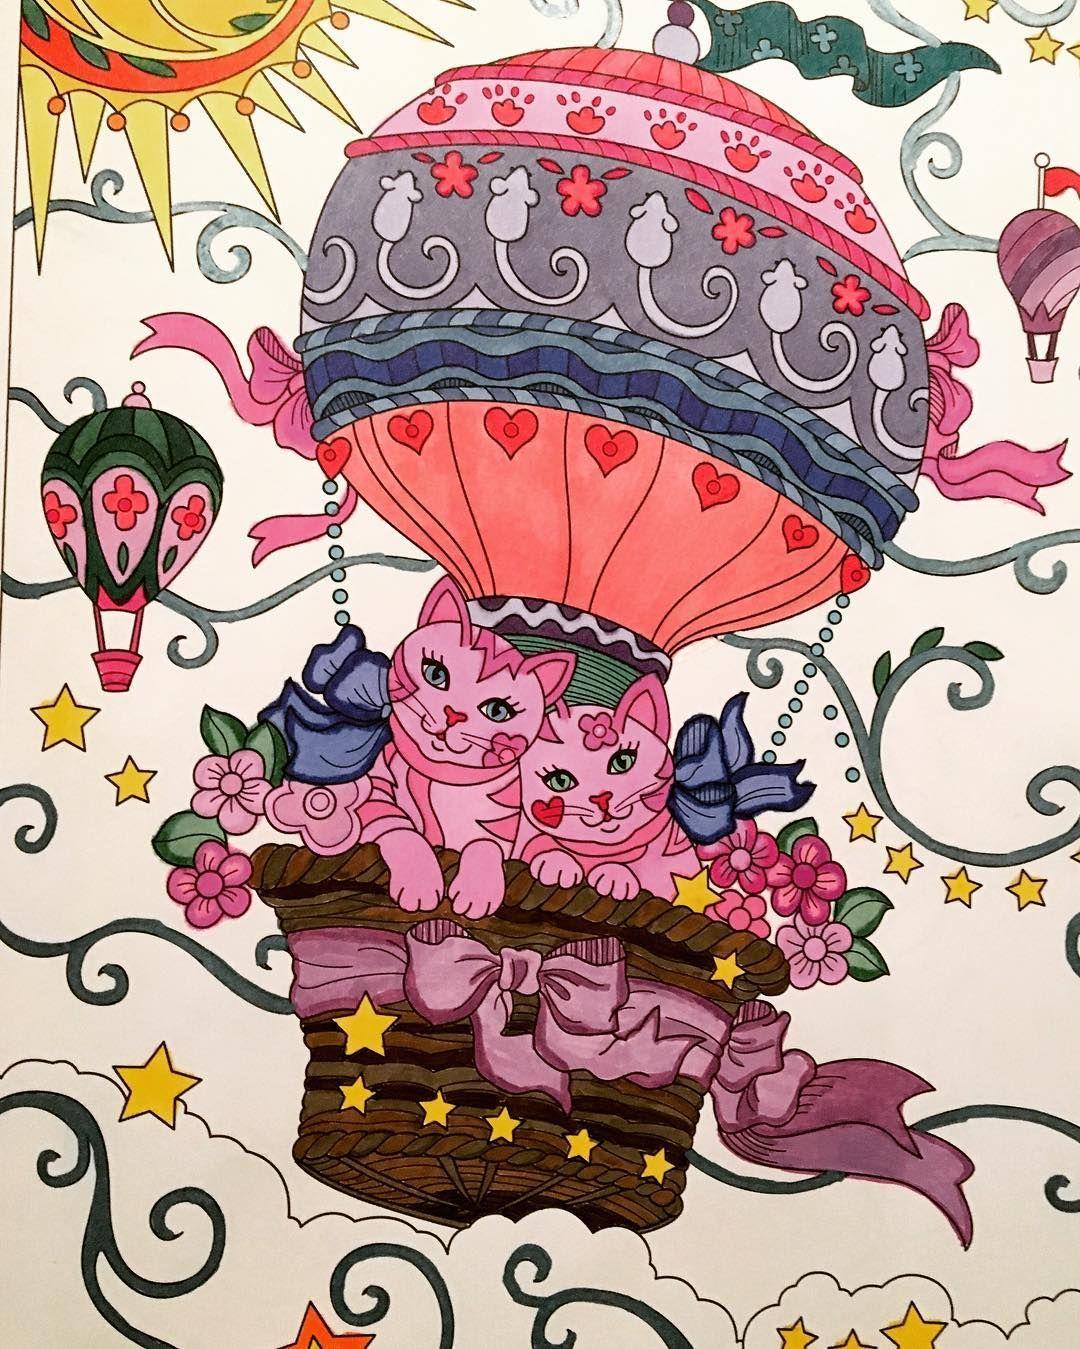 Pampered Pets Coloring Coloringforadults Marjoriesarnat Pampered Pets Coloring Book Cat Coloring Book Cat Colors